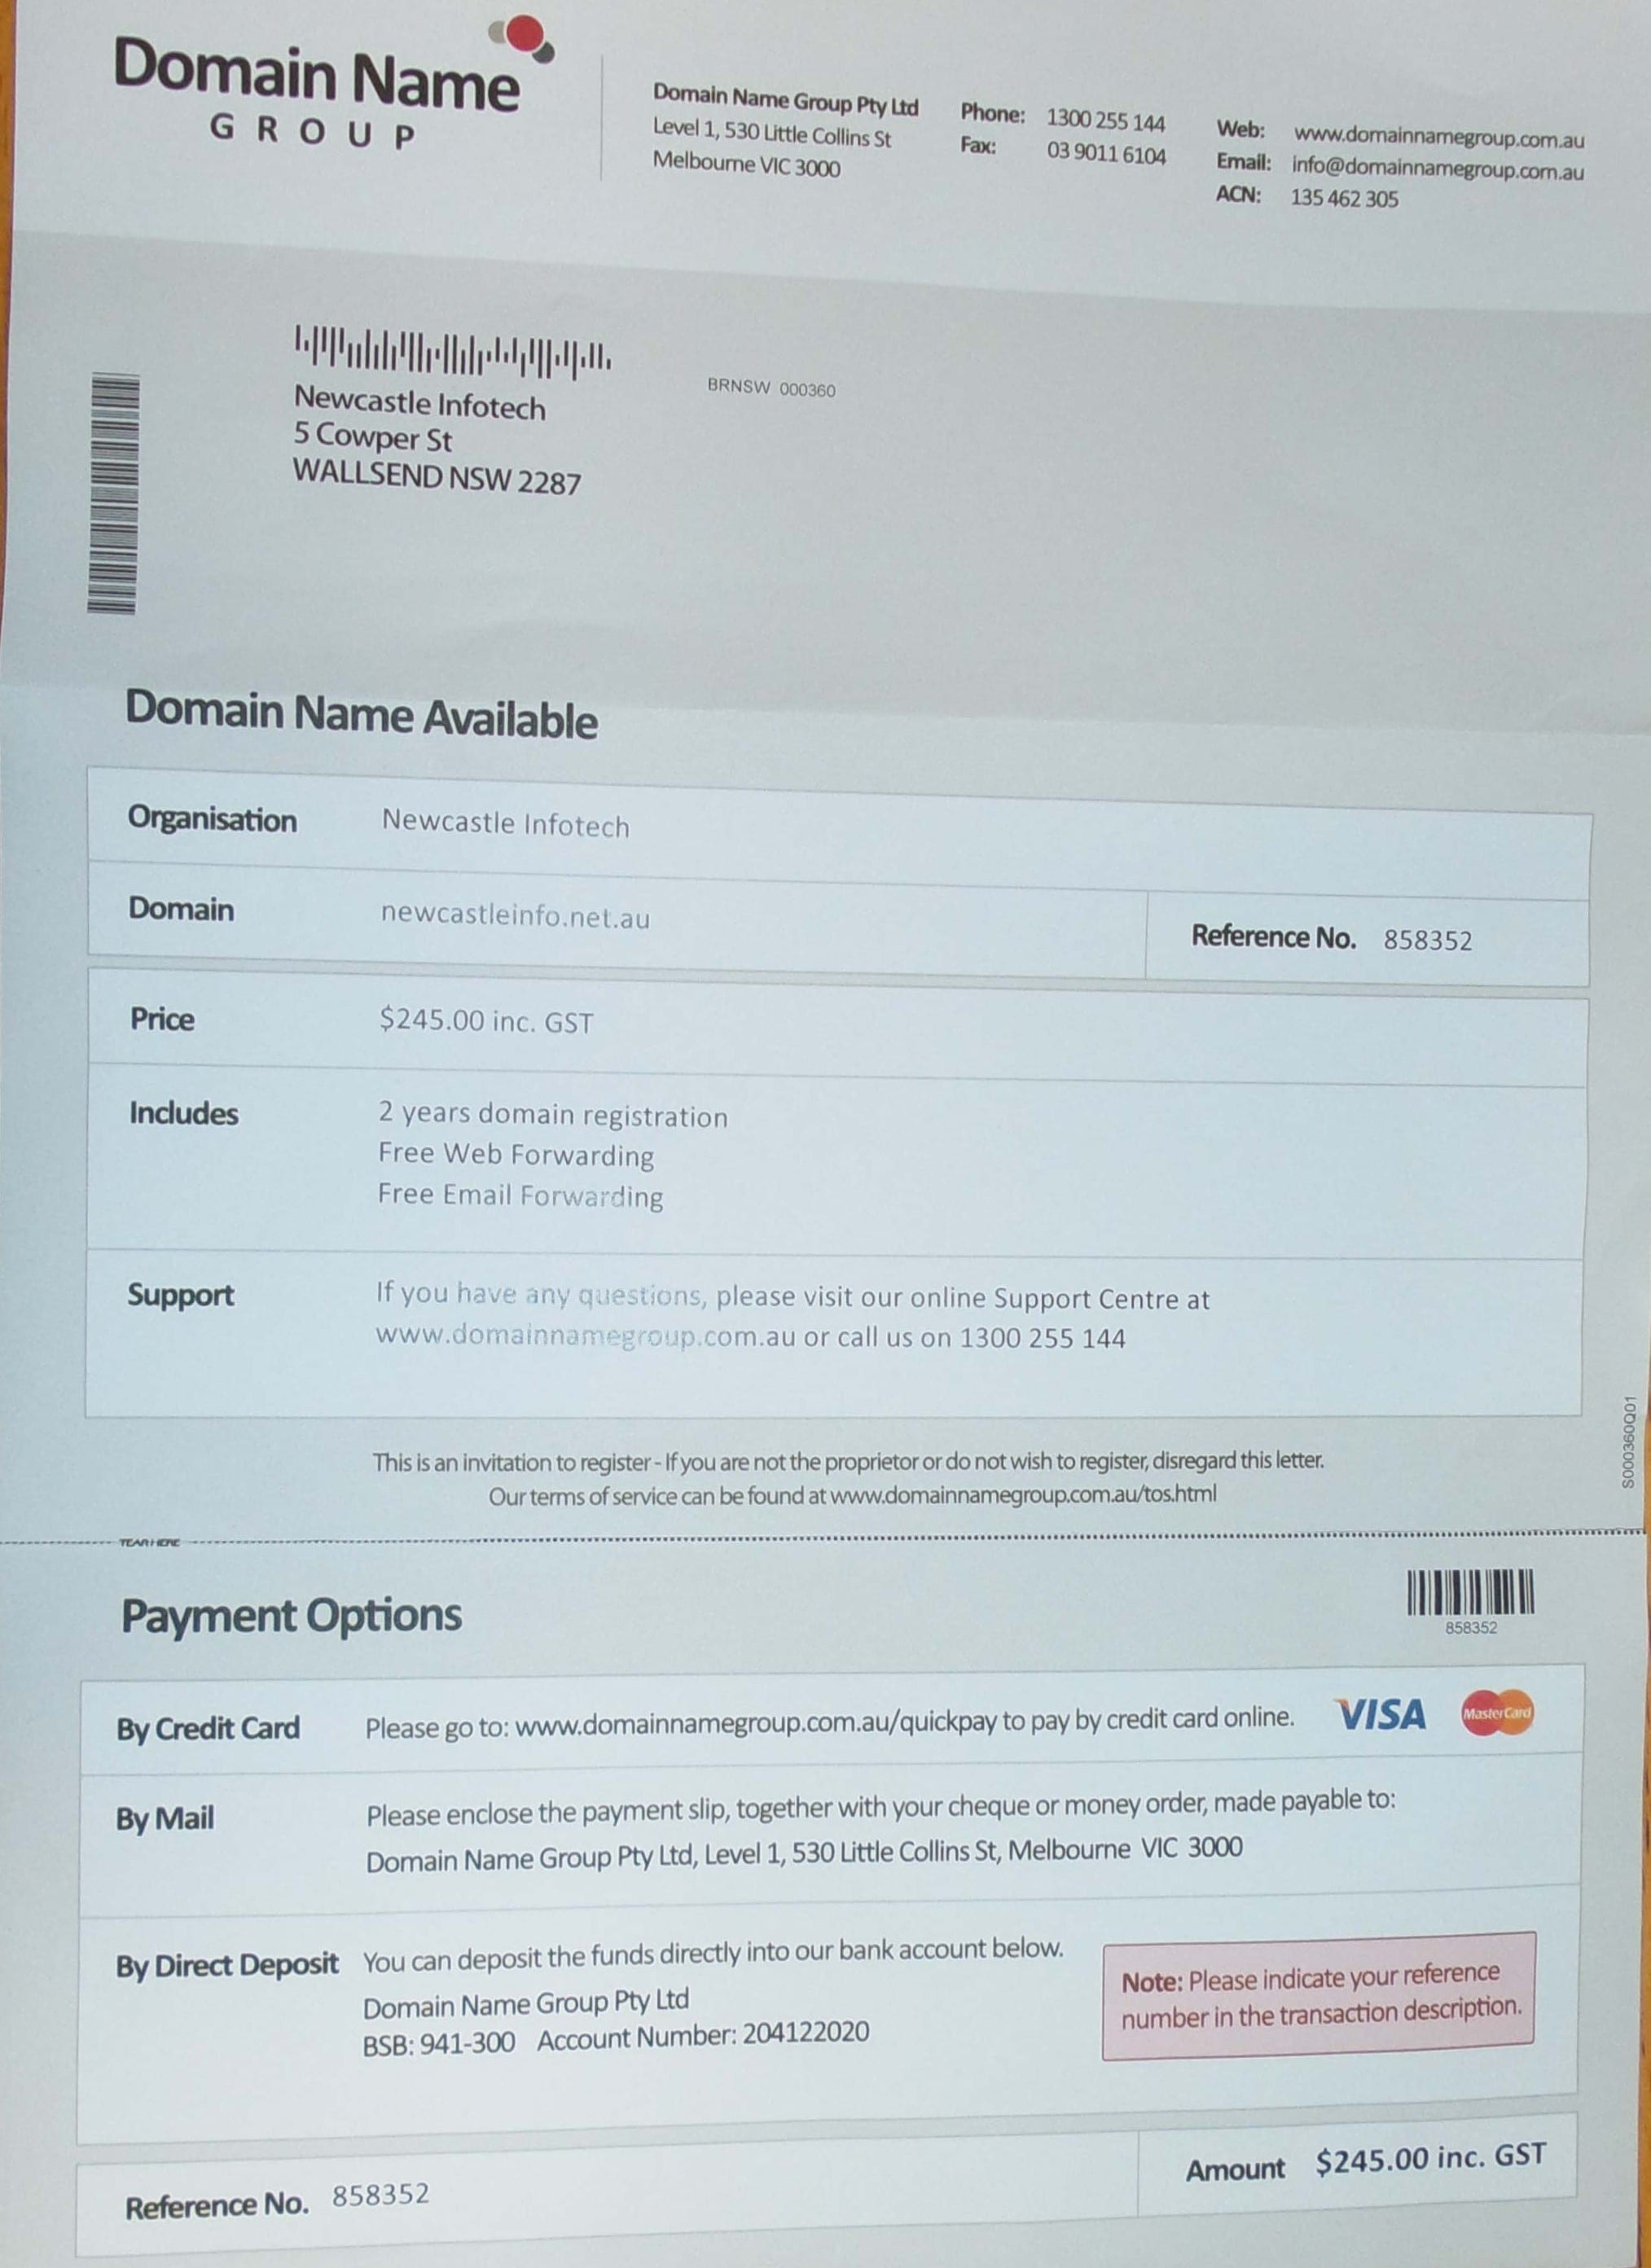 Domain Name Corp Pty Ltd